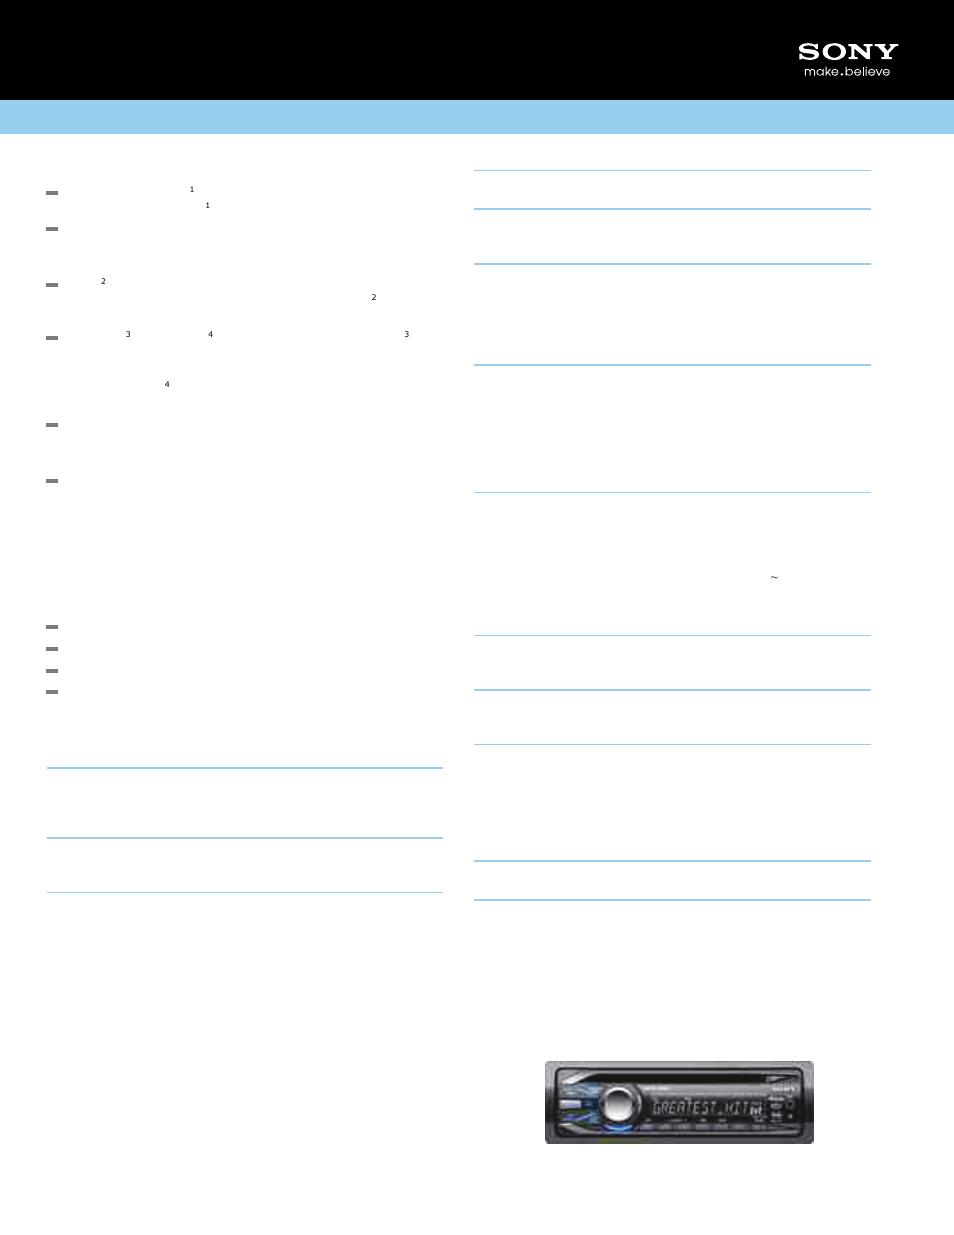 Sony Cdx Gt34w Stereo Wiring Diagram   Wiring Diagram Sony Cdx Gt W Wiring Diagram Manual on sony wiring harness colors, sony cdx gt57up wiring-diagram, sony cdx m20 wiring-diagram, sony cdx gt24w, sony cdx gt33w manual,